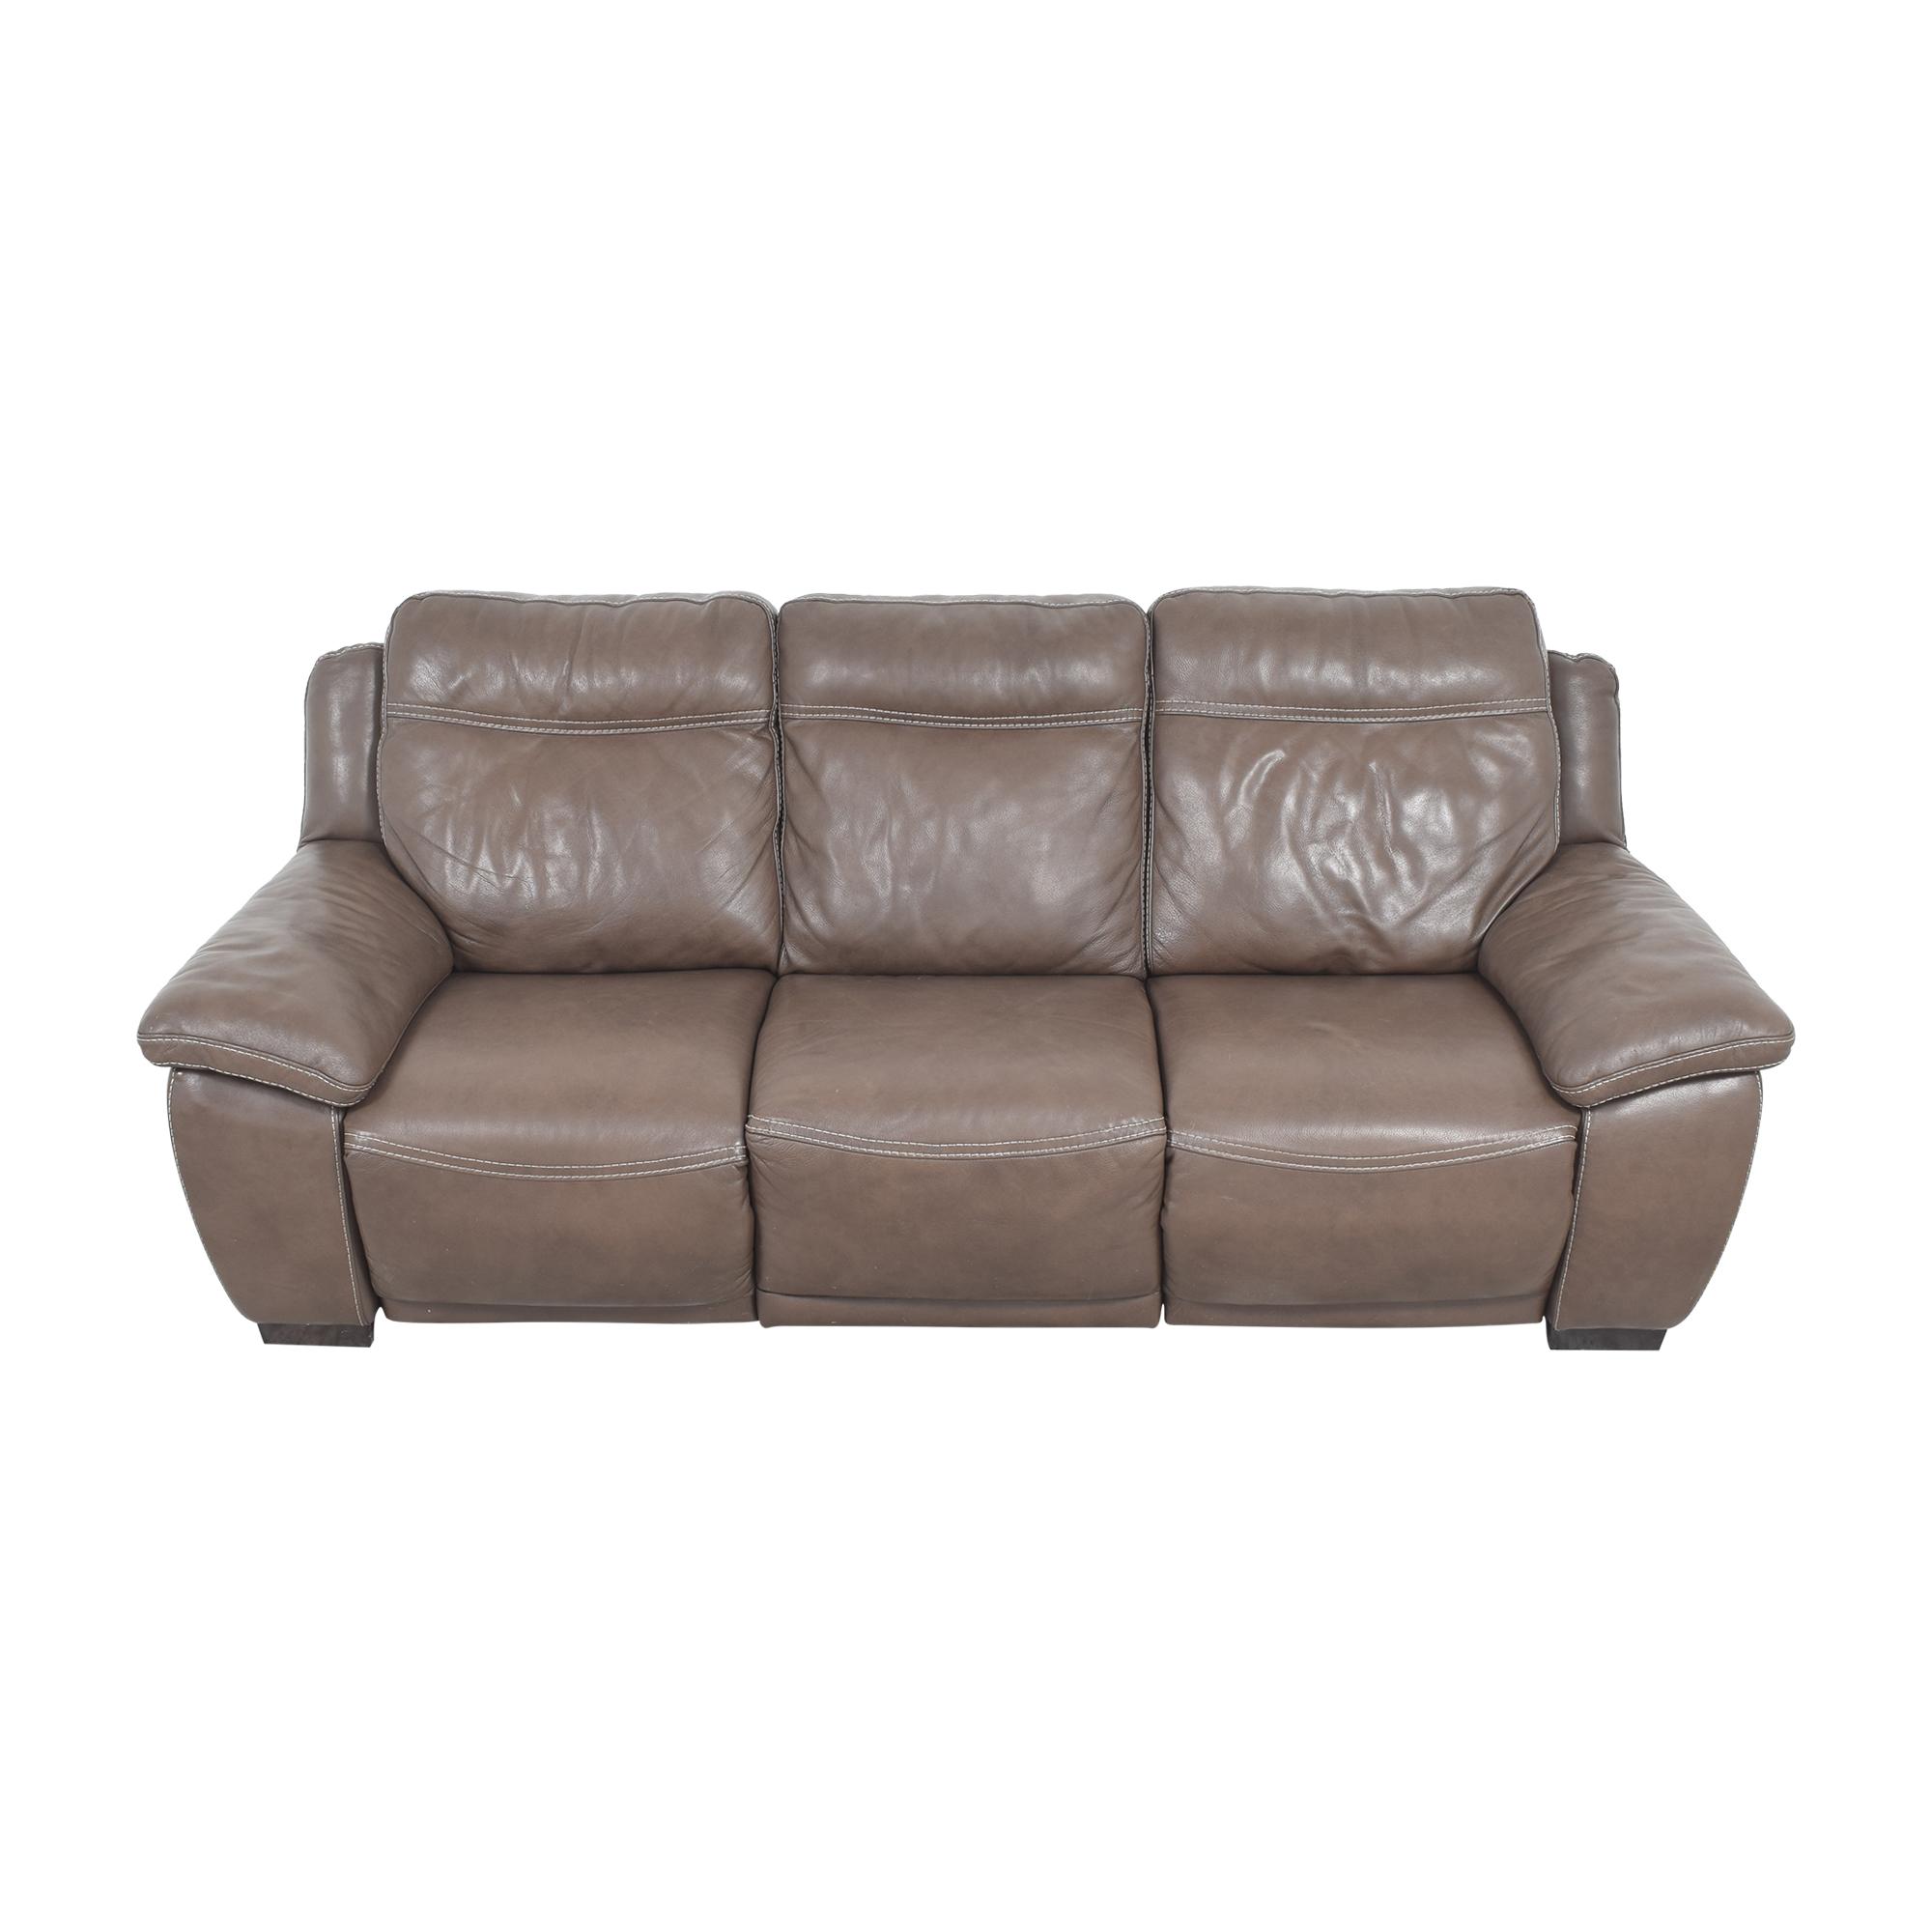 Natuzzi Natuzzi Three Cushion Reclining Sofa for sale